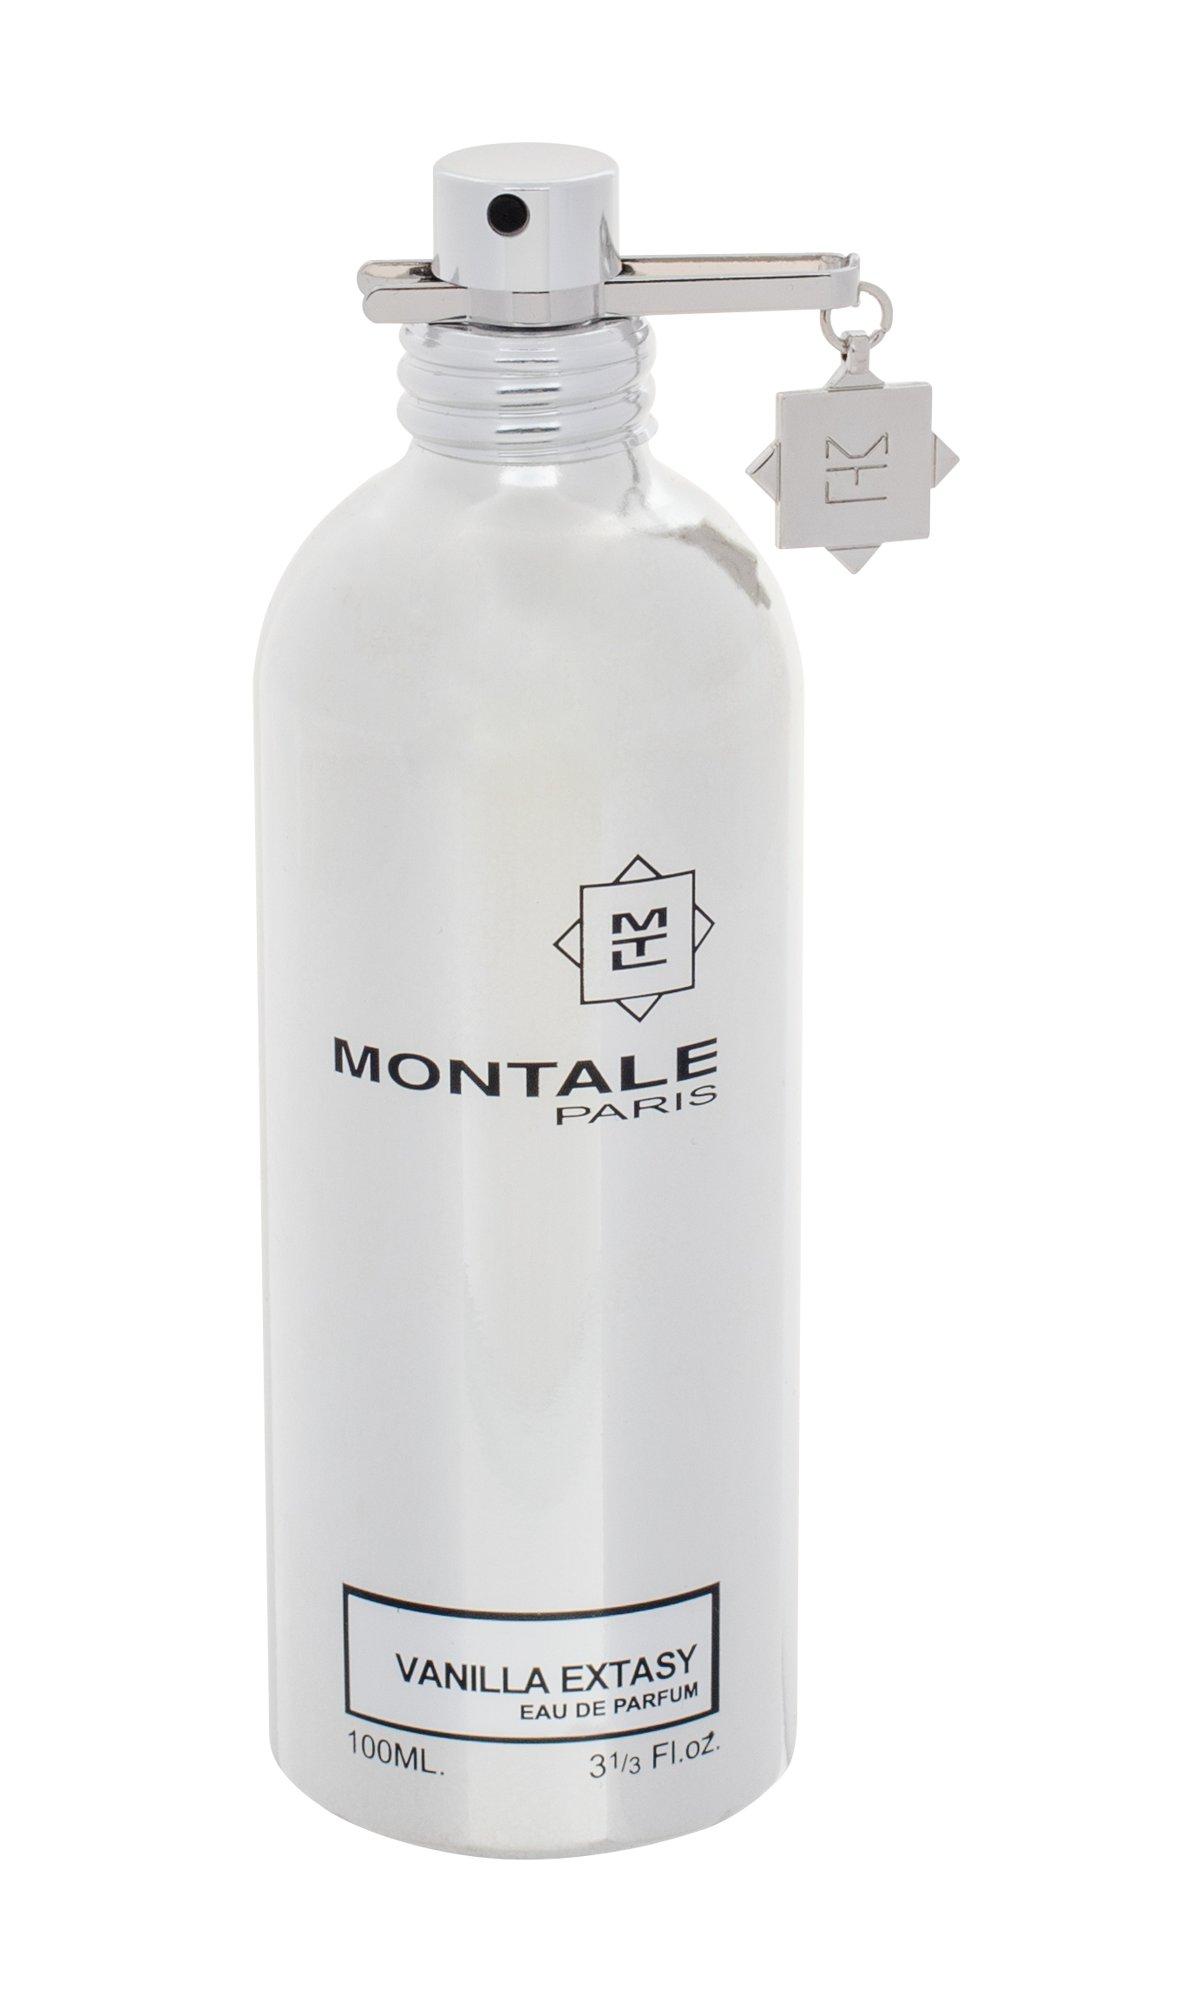 Montale Paris Vanilla Extasy, Parfumovaná voda 100ml